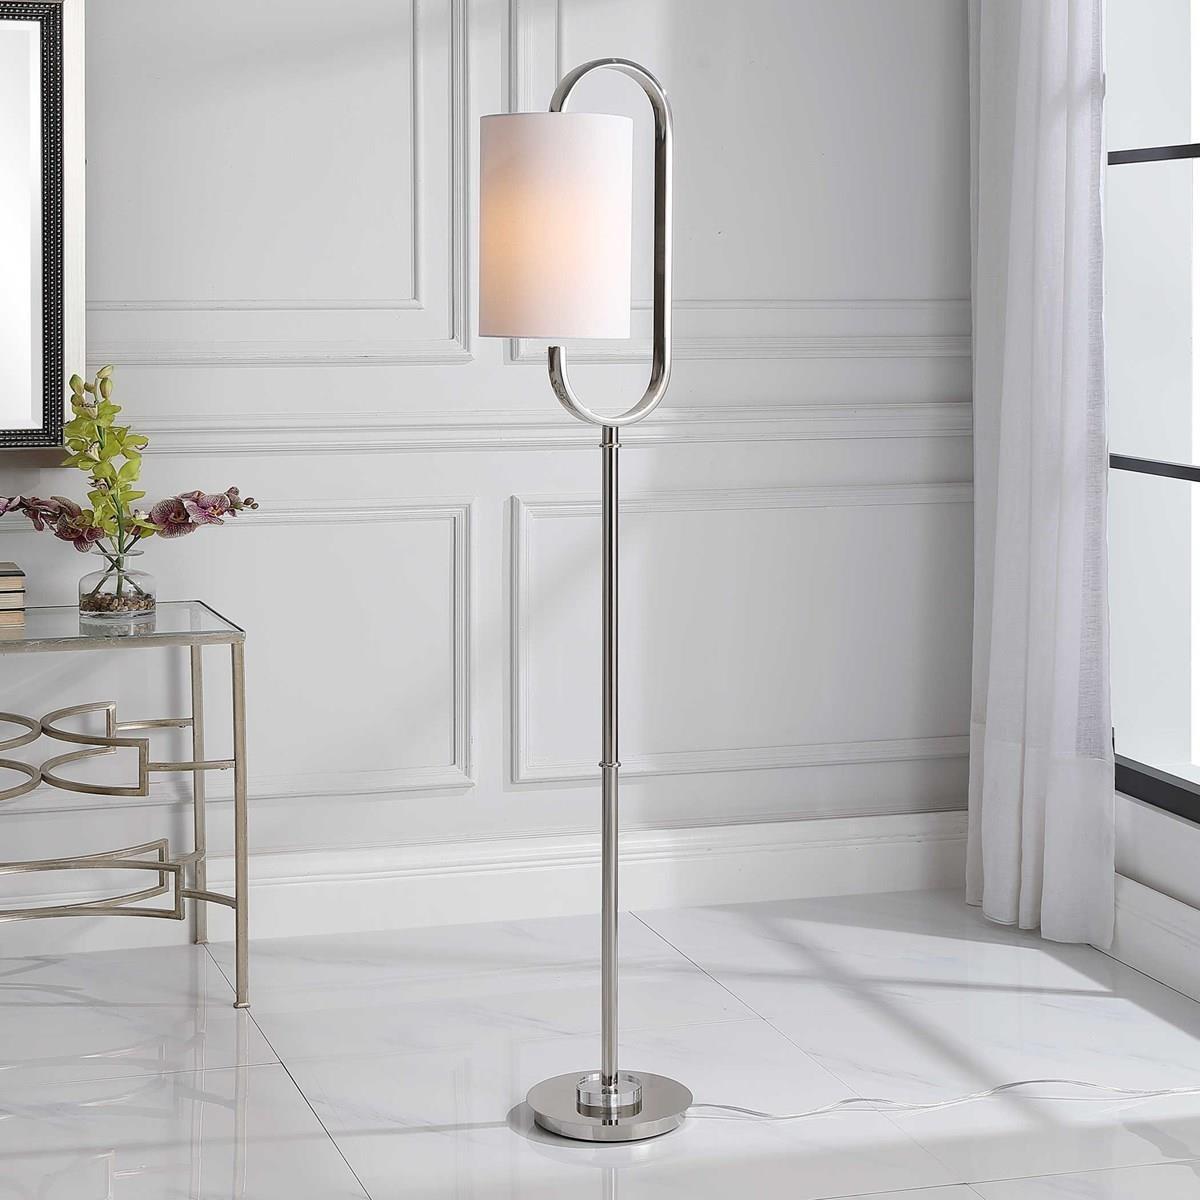 Floor Lamps SLOANE FLOOR LAMP by Unique at Walker's Furniture